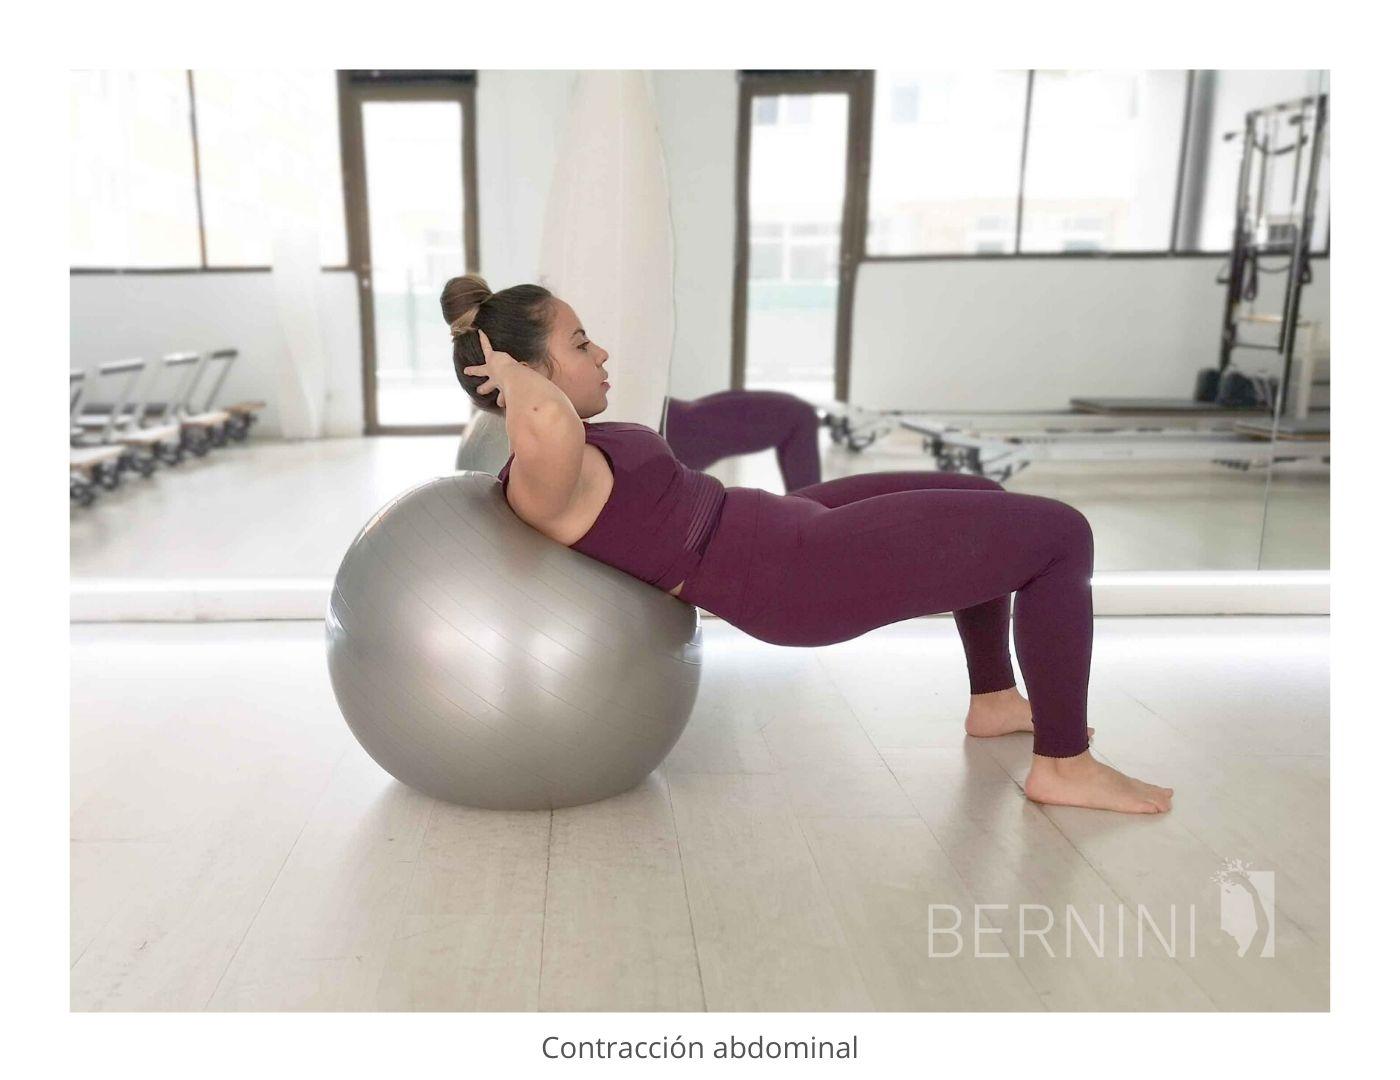 contracción abdominal fitball pilates mat bernini wellness